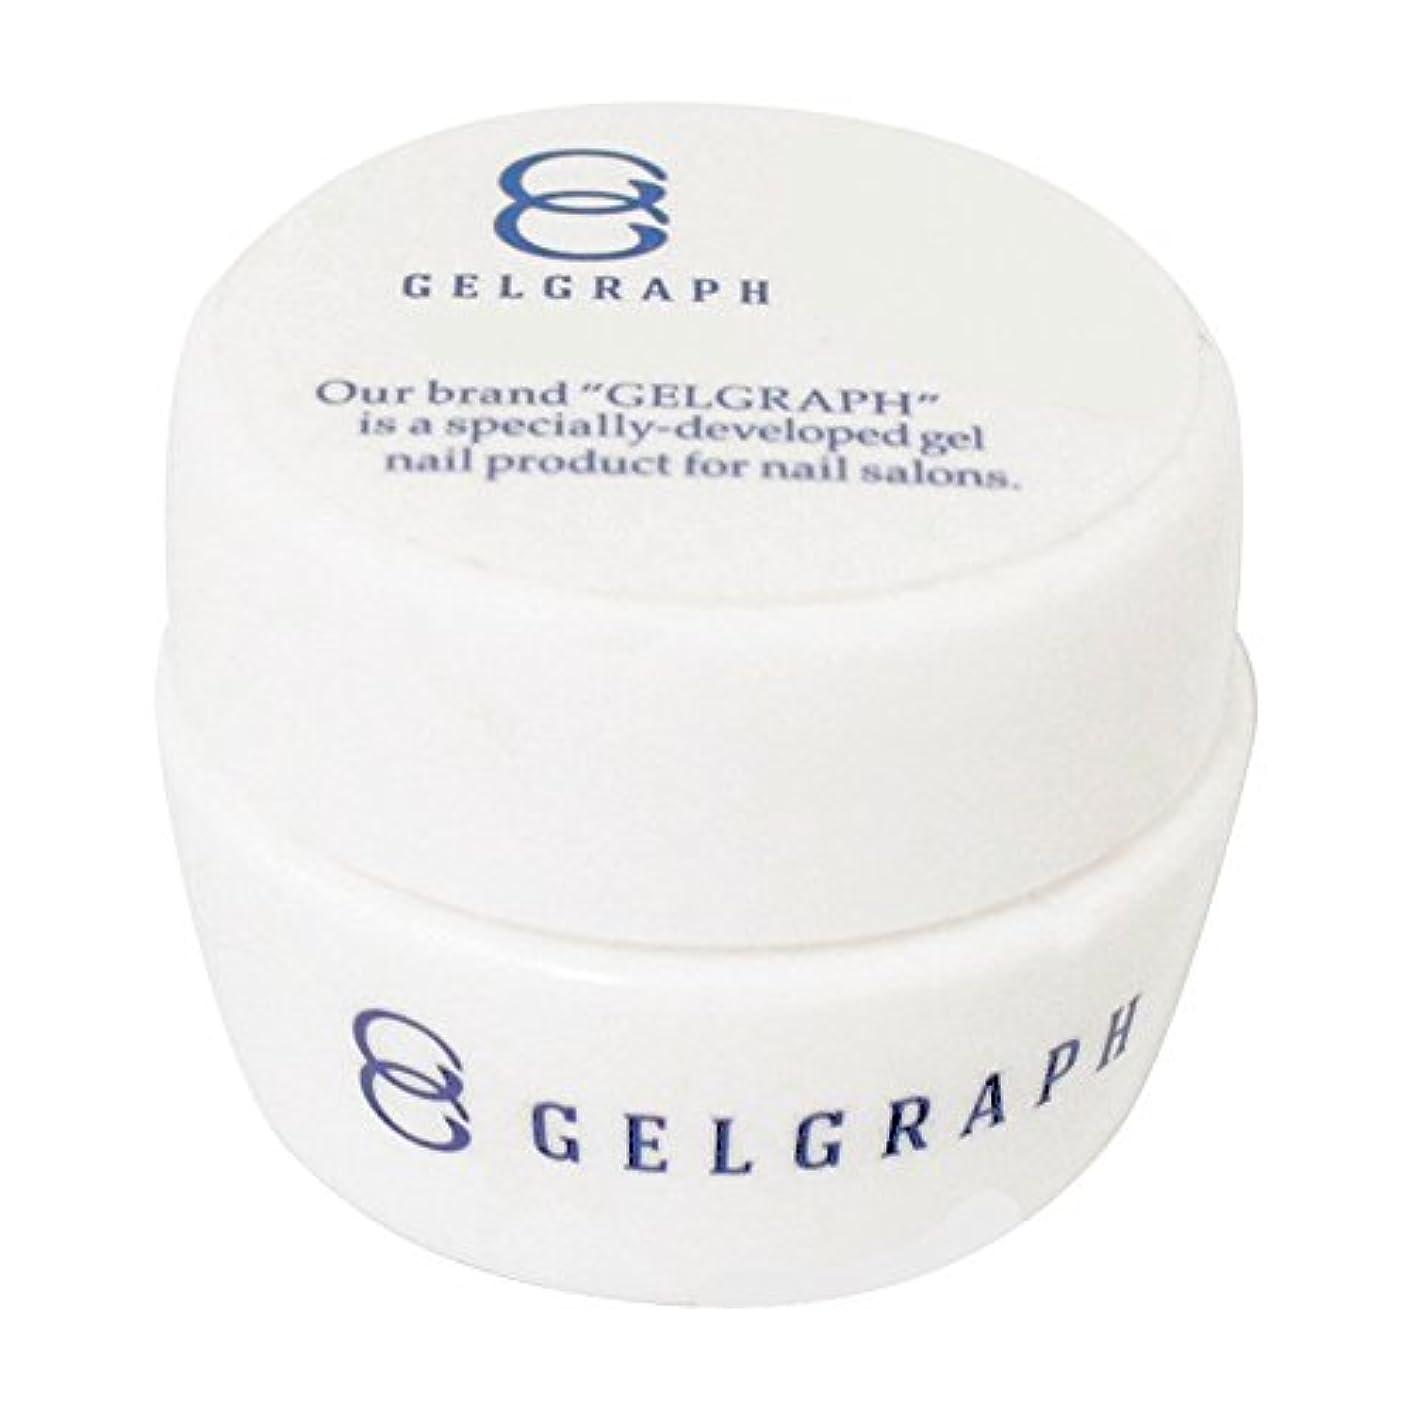 GELGRAPH カラージェル 108G スプモーニ 5g UV/LED対応 ソークオフジェル